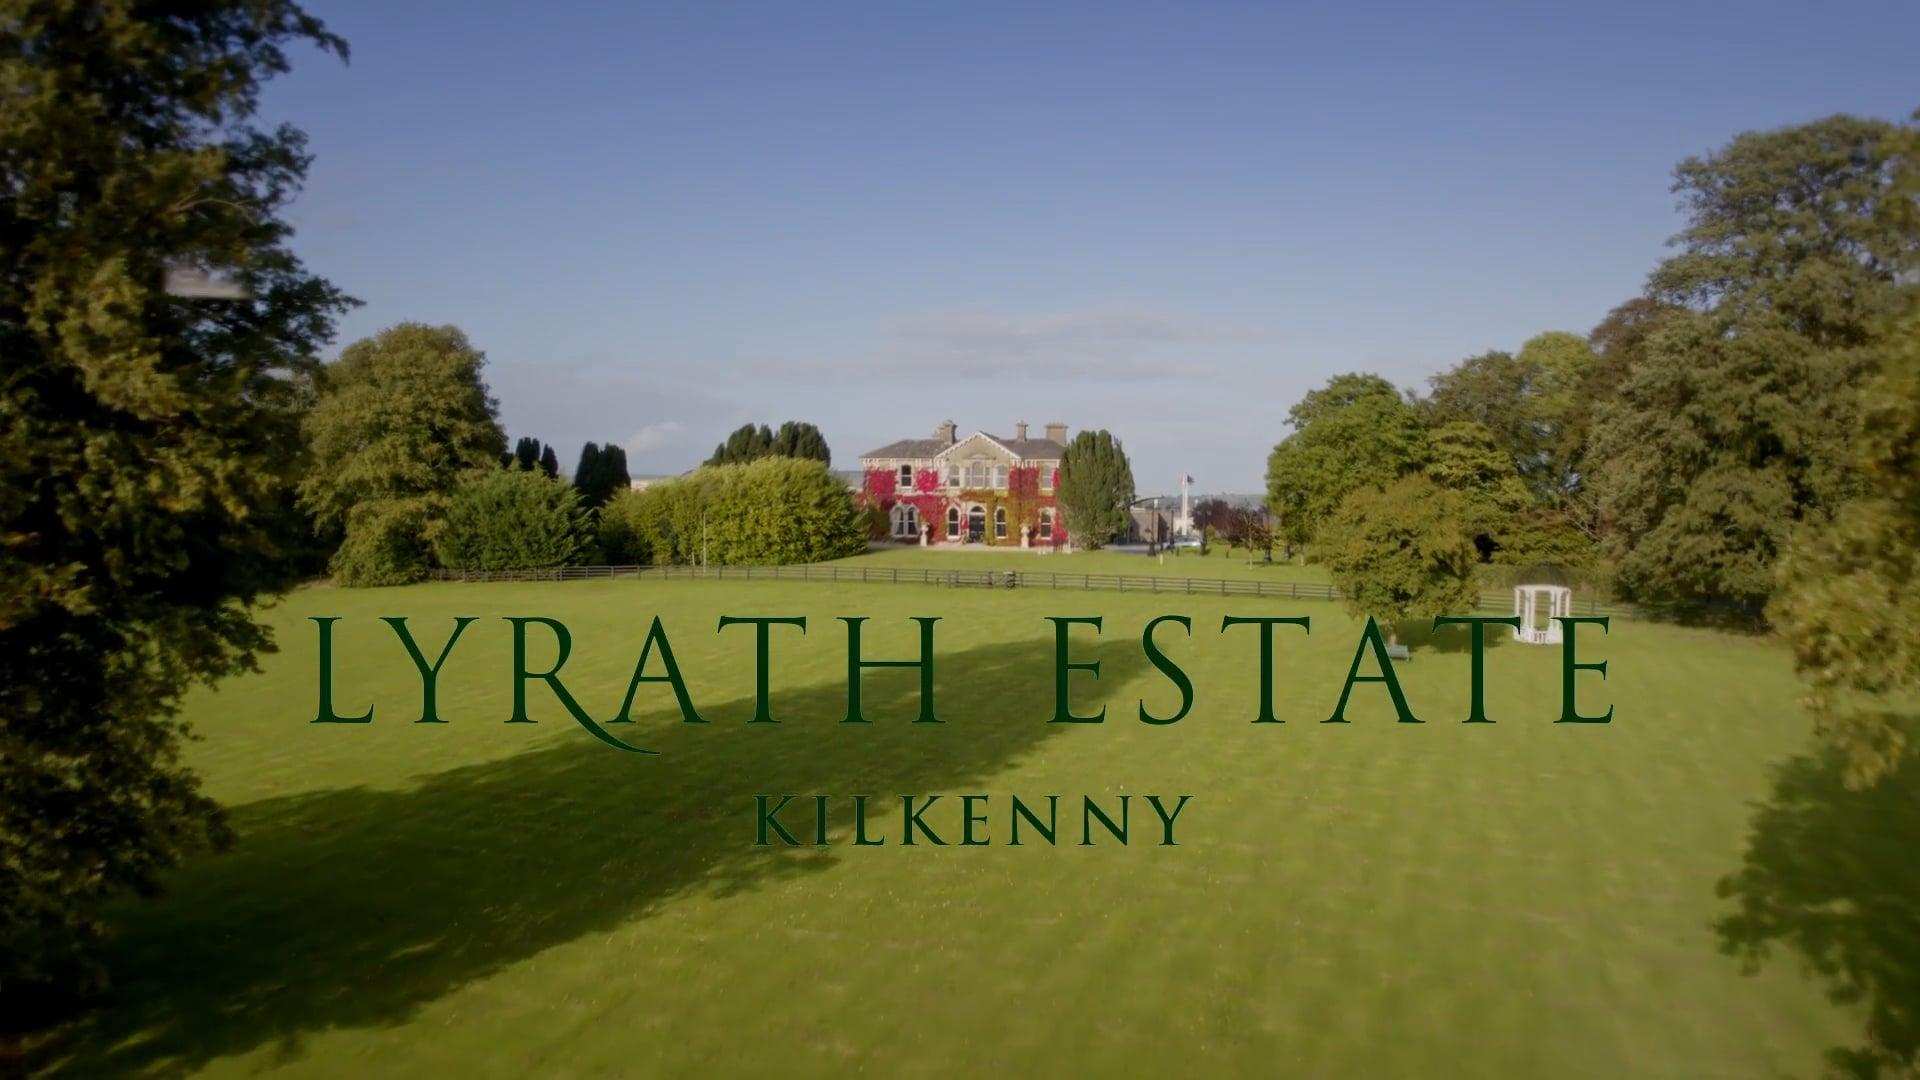 Lyrath Estate Leisure Video